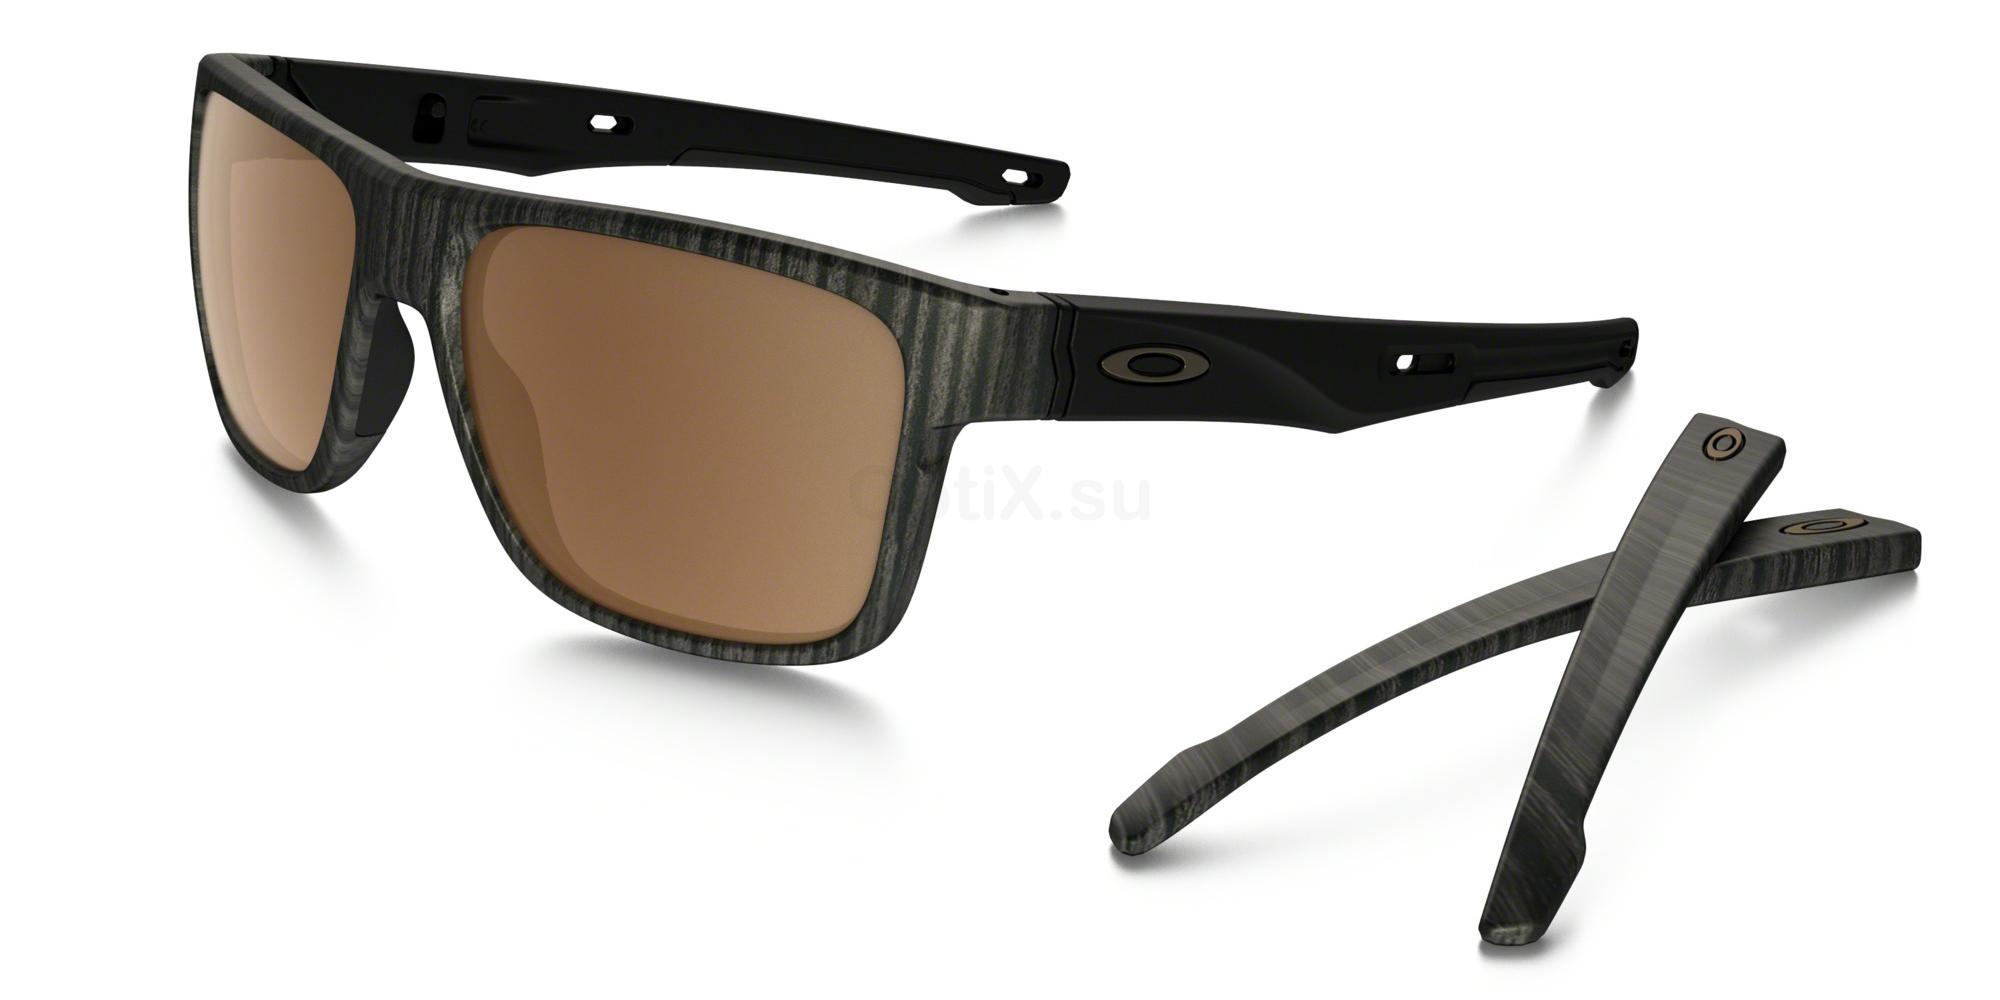 936107 OO9361 CROSSRANGE Sunglasses, Oakley